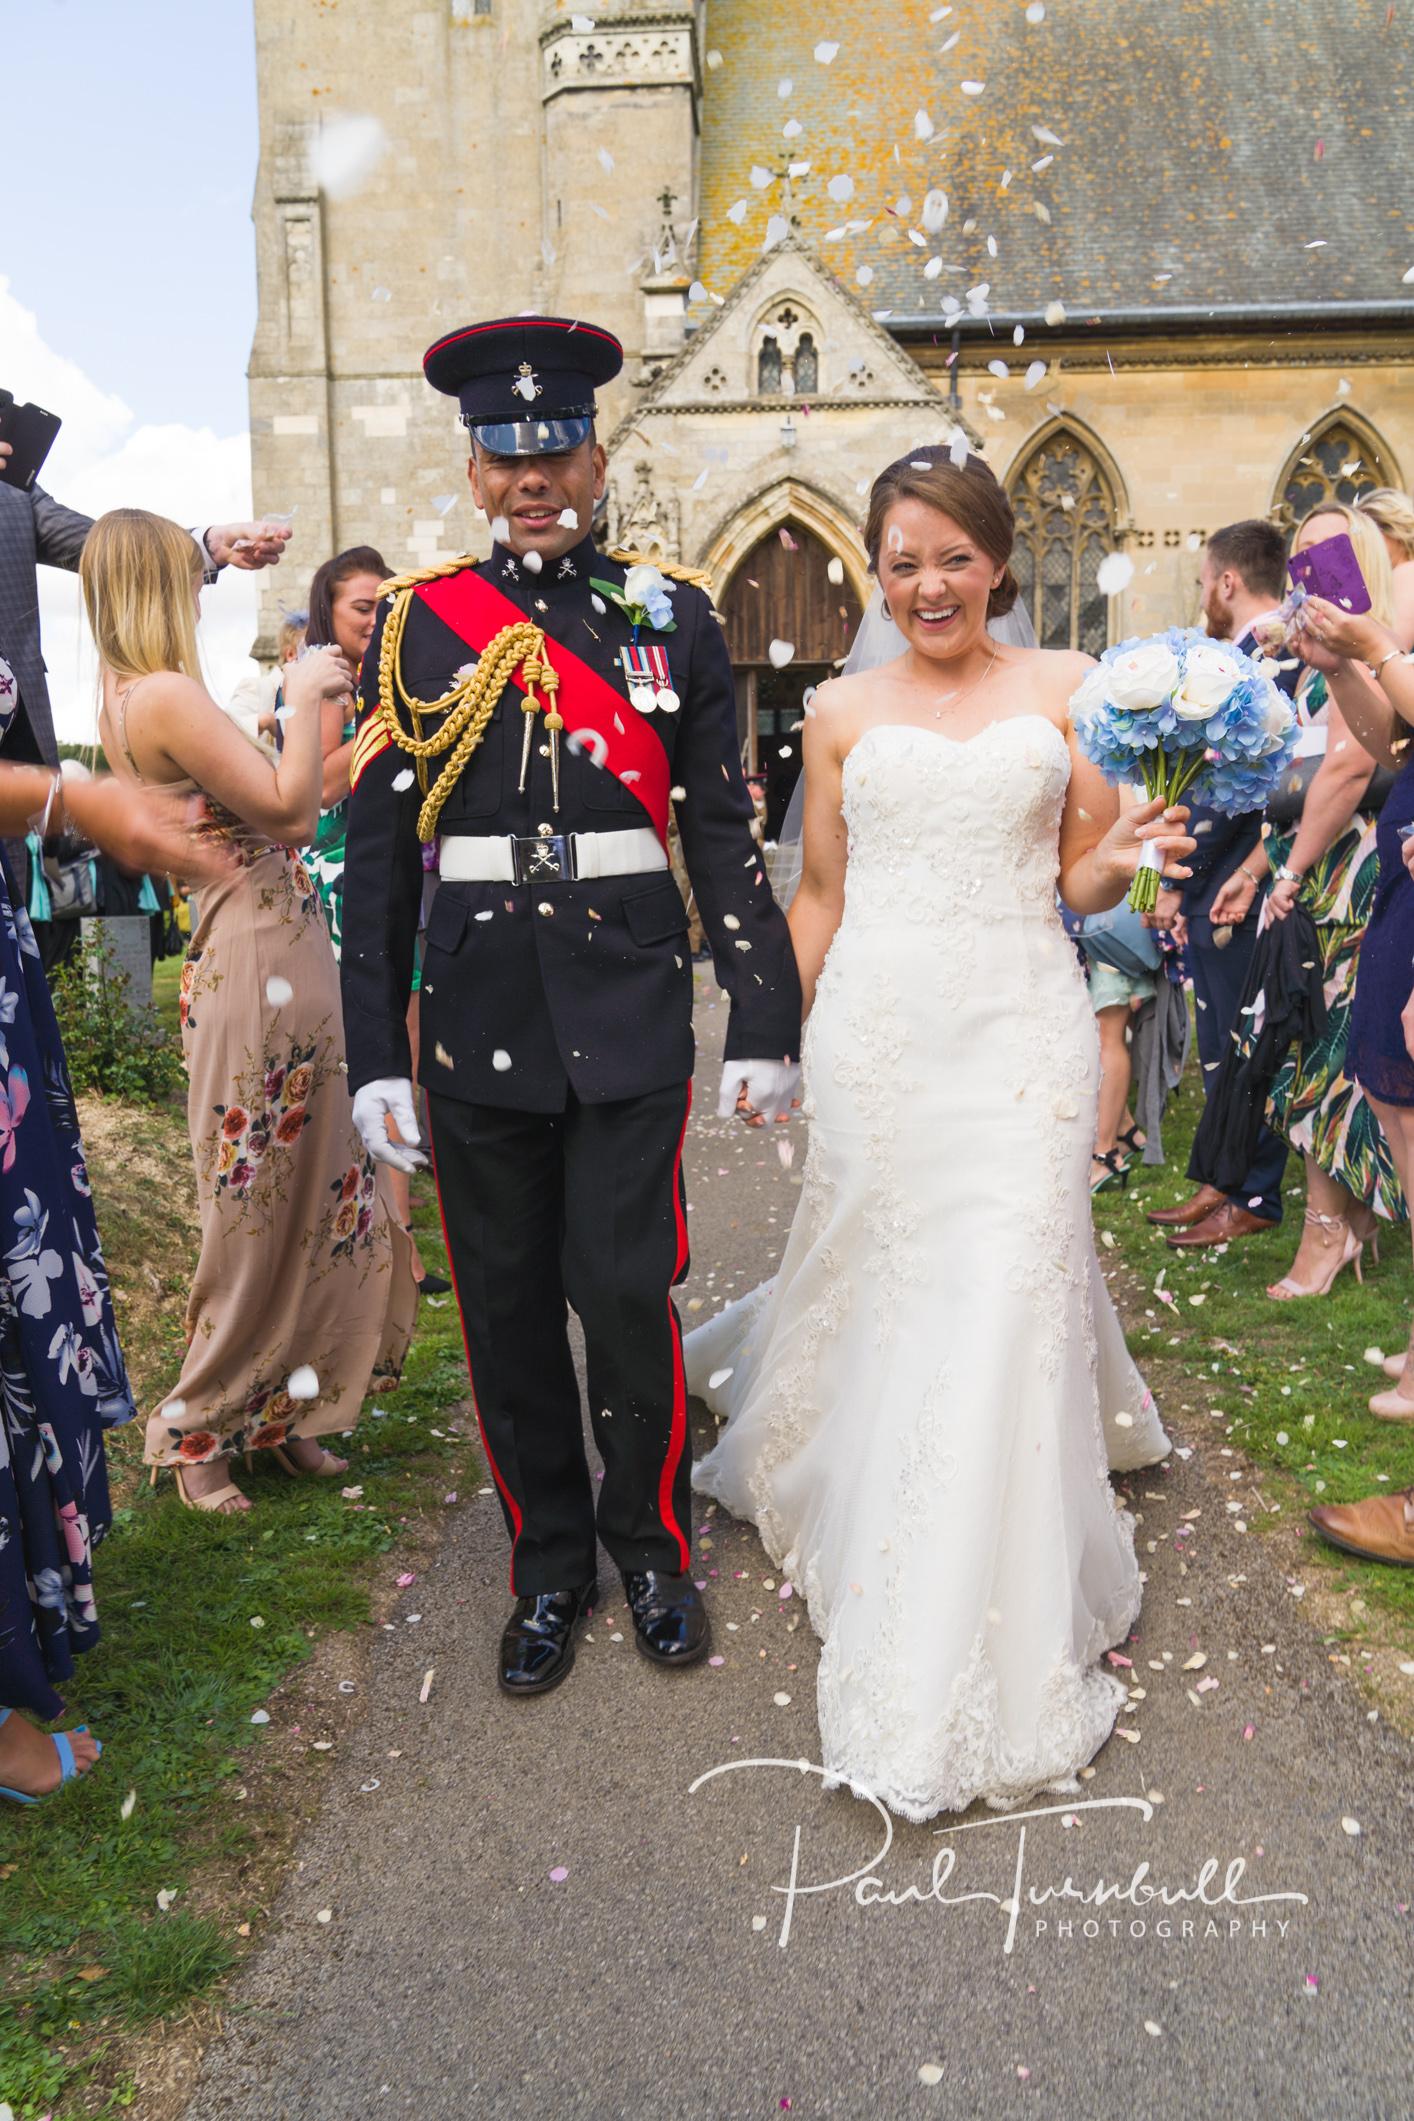 wedding-photographer-south-dalton-walkington-yorkshire-emma-james-039.jpg